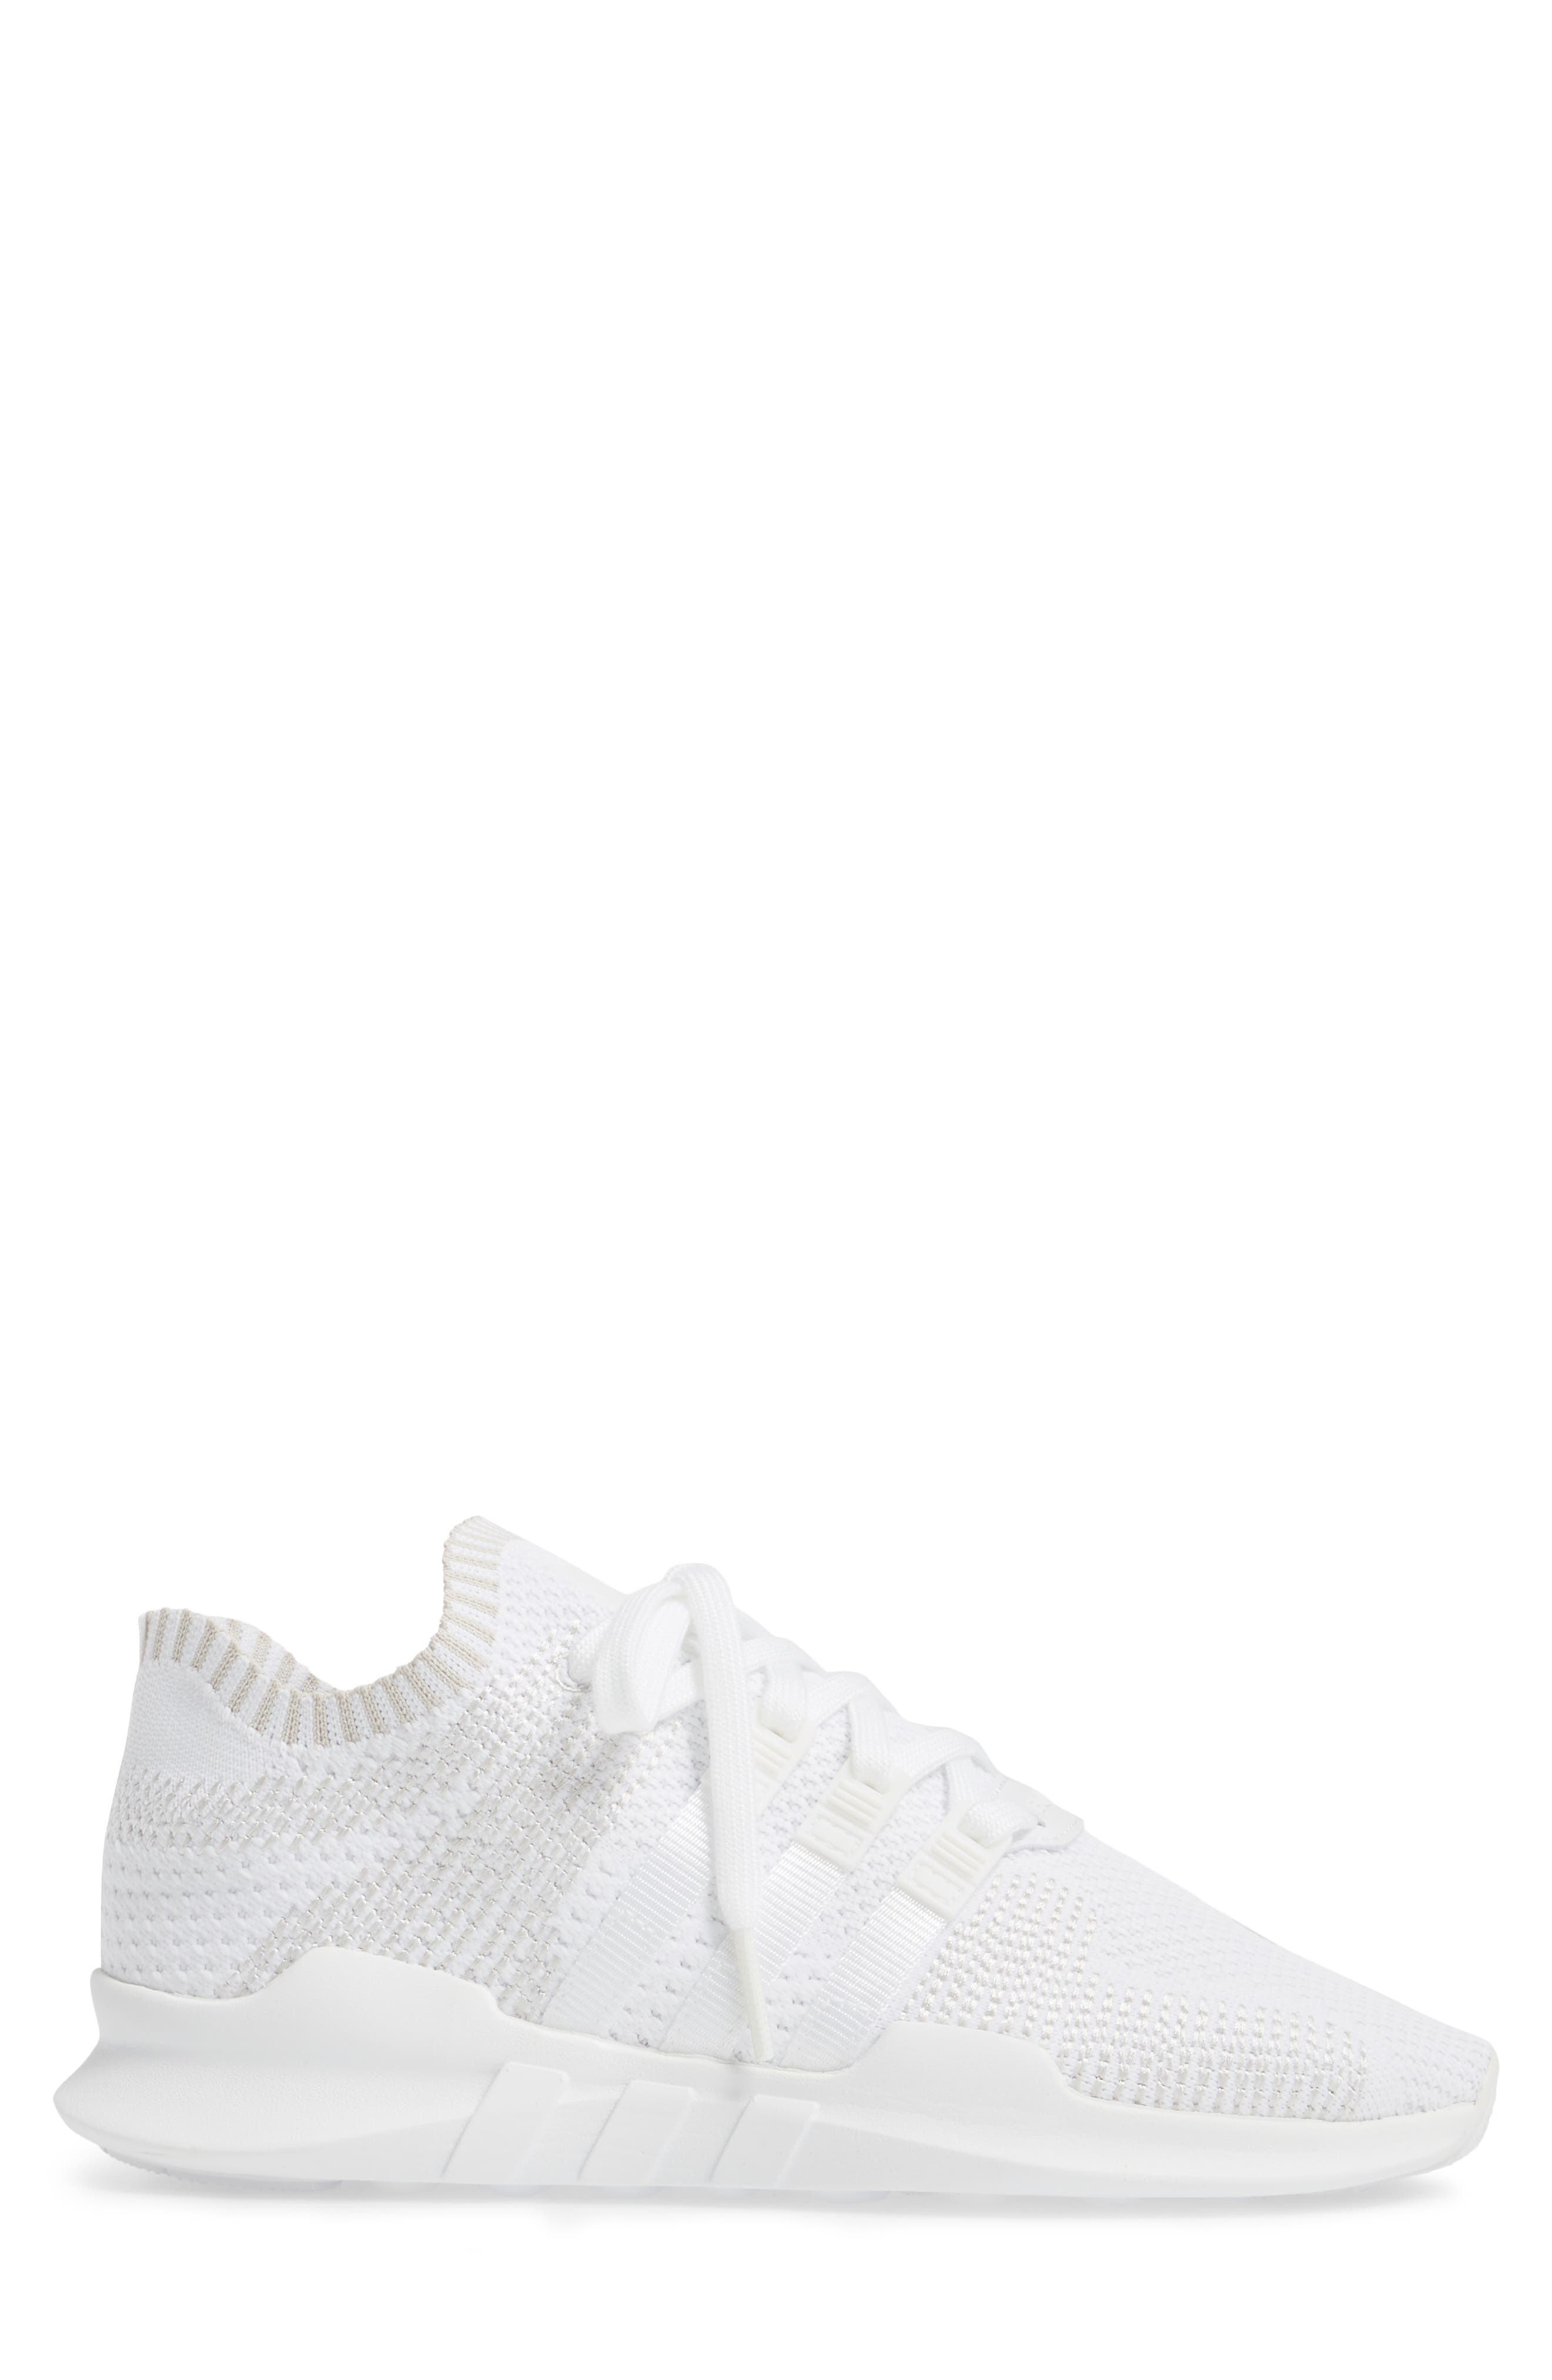 EQT Support ADV PrimeKnit Sneaker,                             Alternate thumbnail 3, color,                             White/ White/ Sub Green